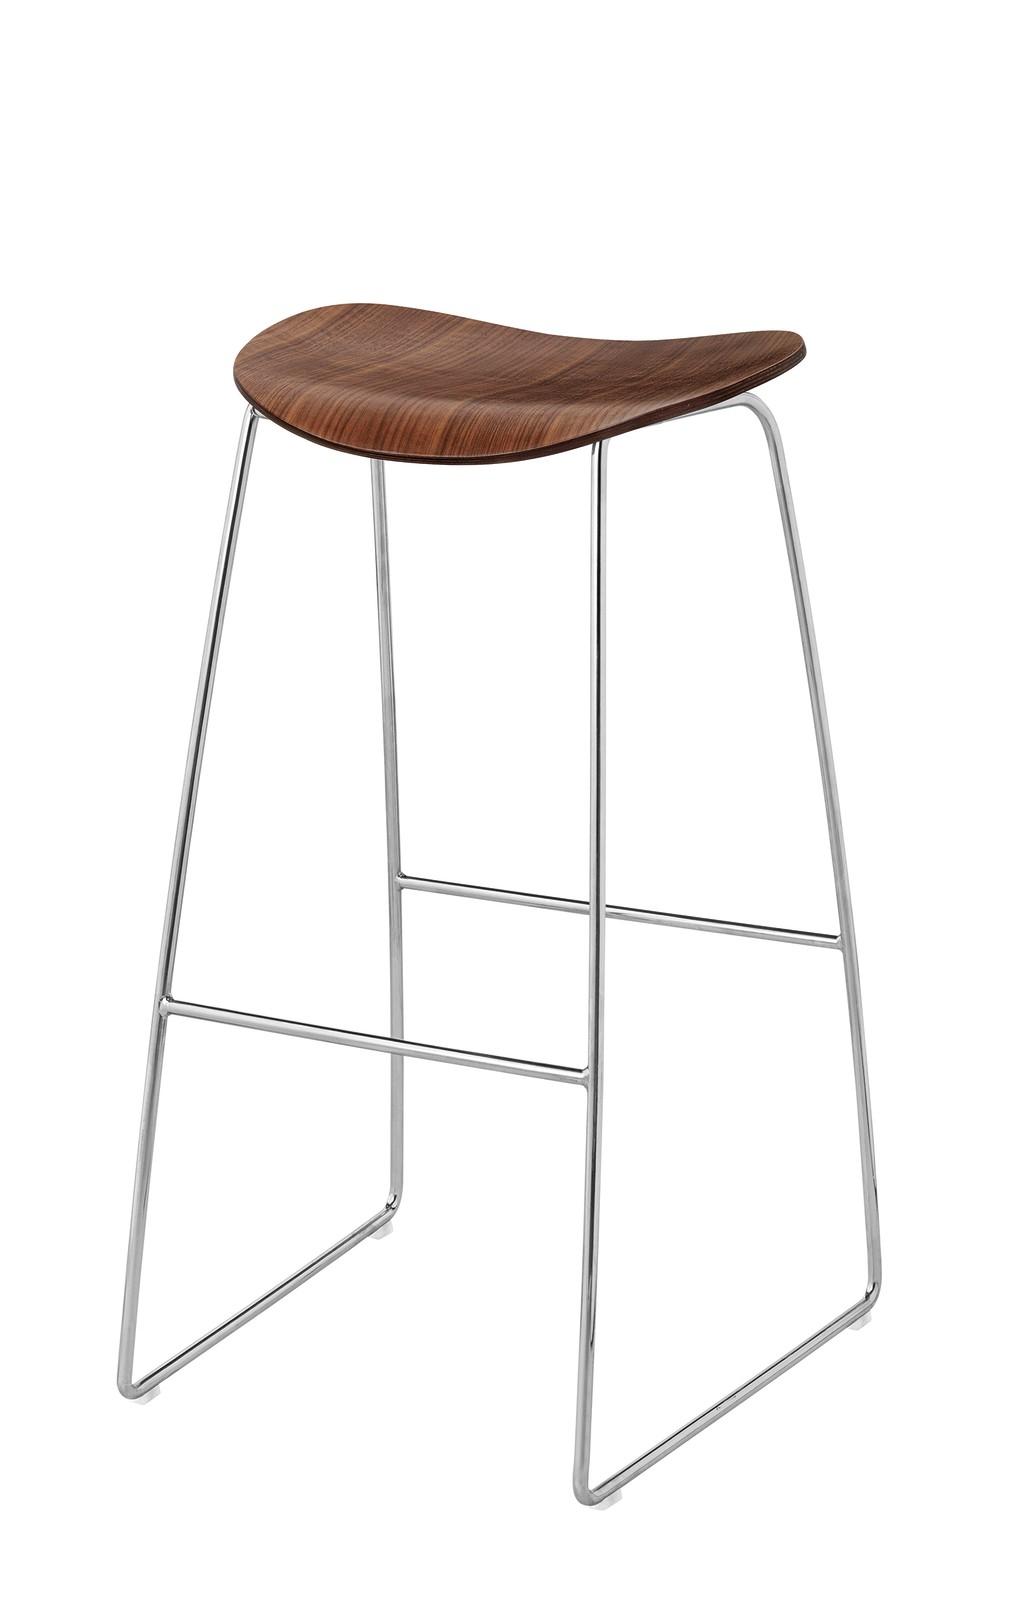 Gubi 2D Bar Stool Sledge Base - Unupholstered Gubi Wood American Walnut, Gubi Metal Chrome